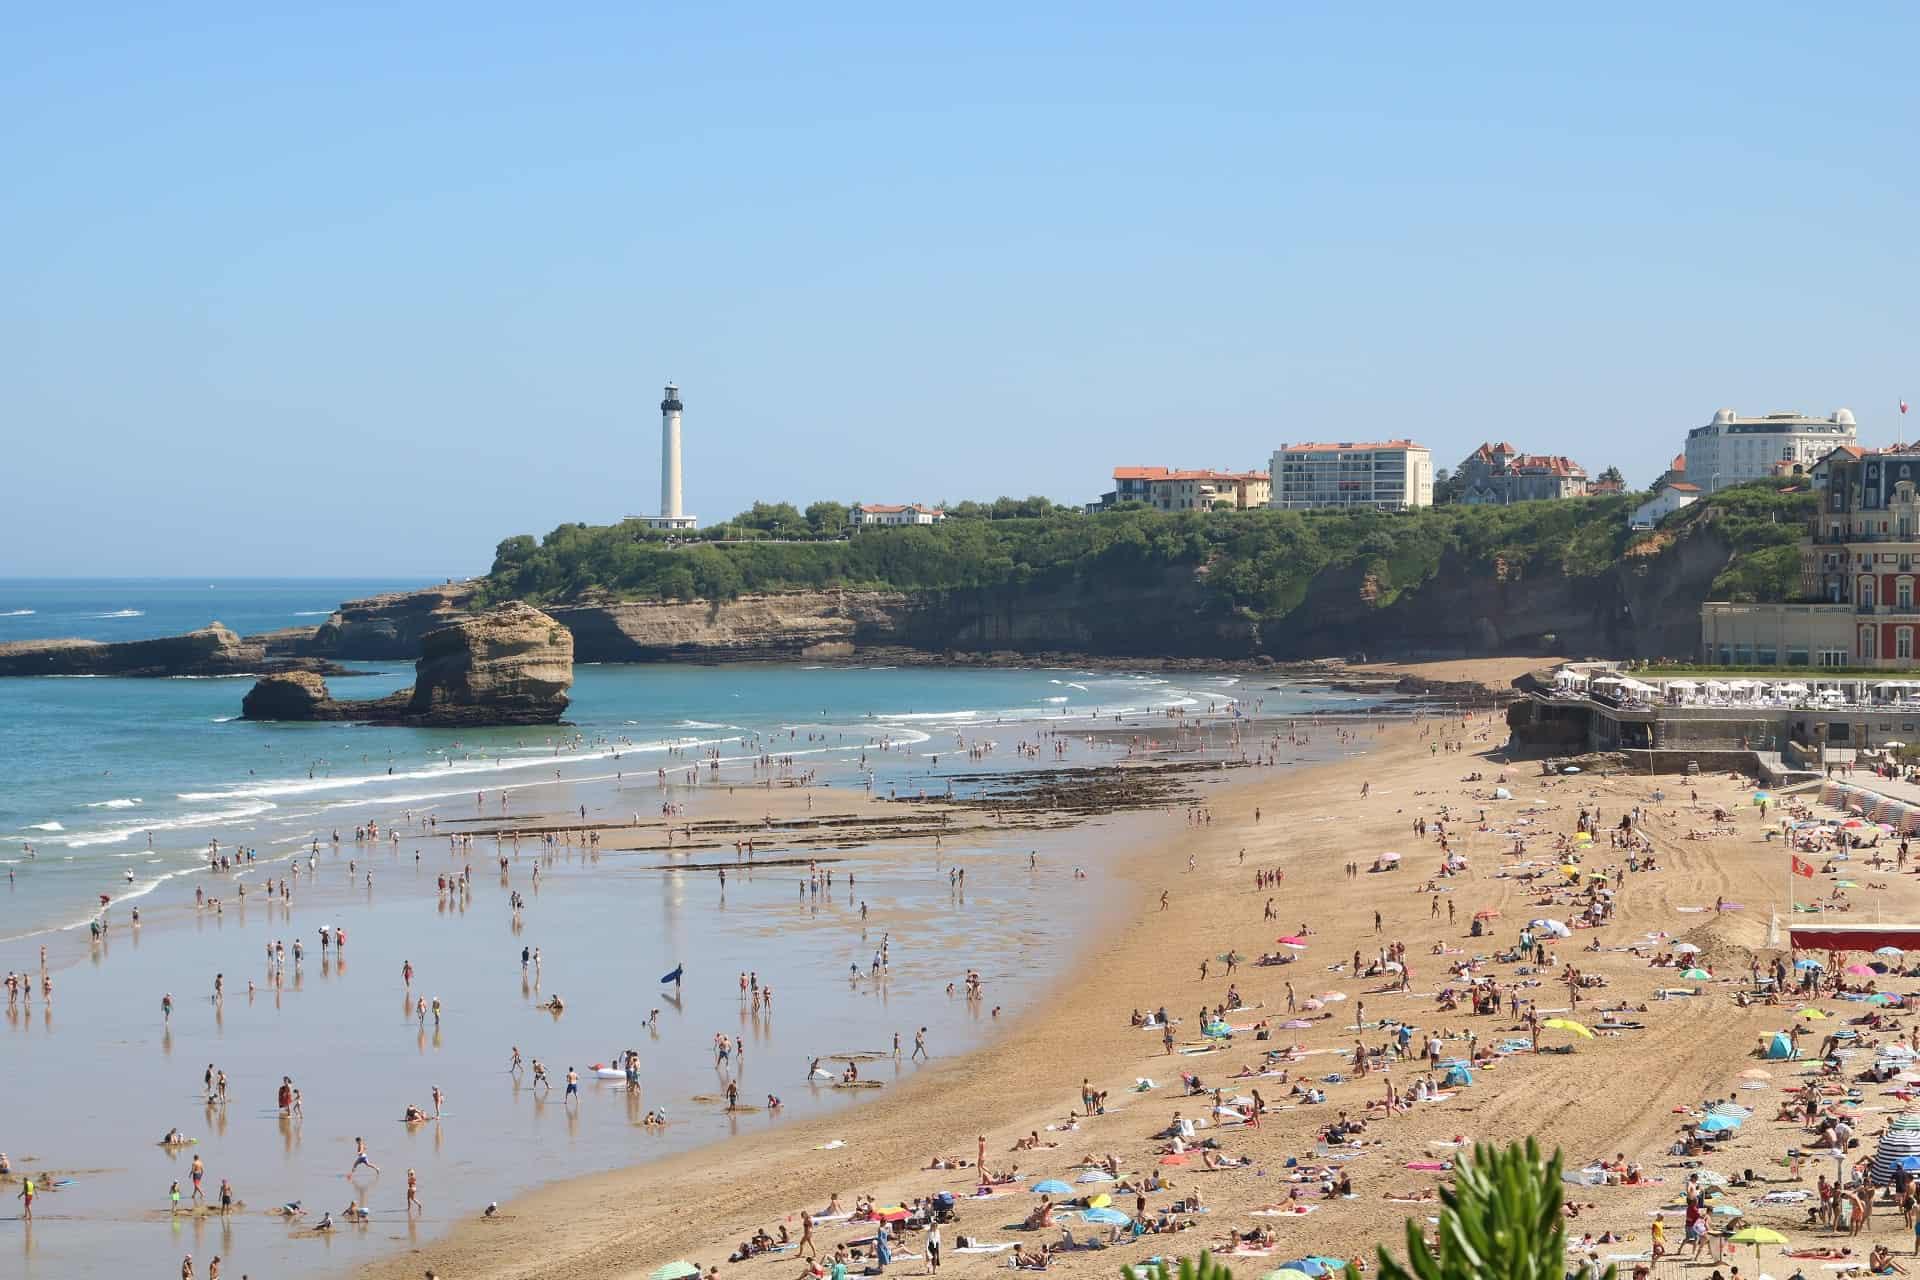 plages de biarritz